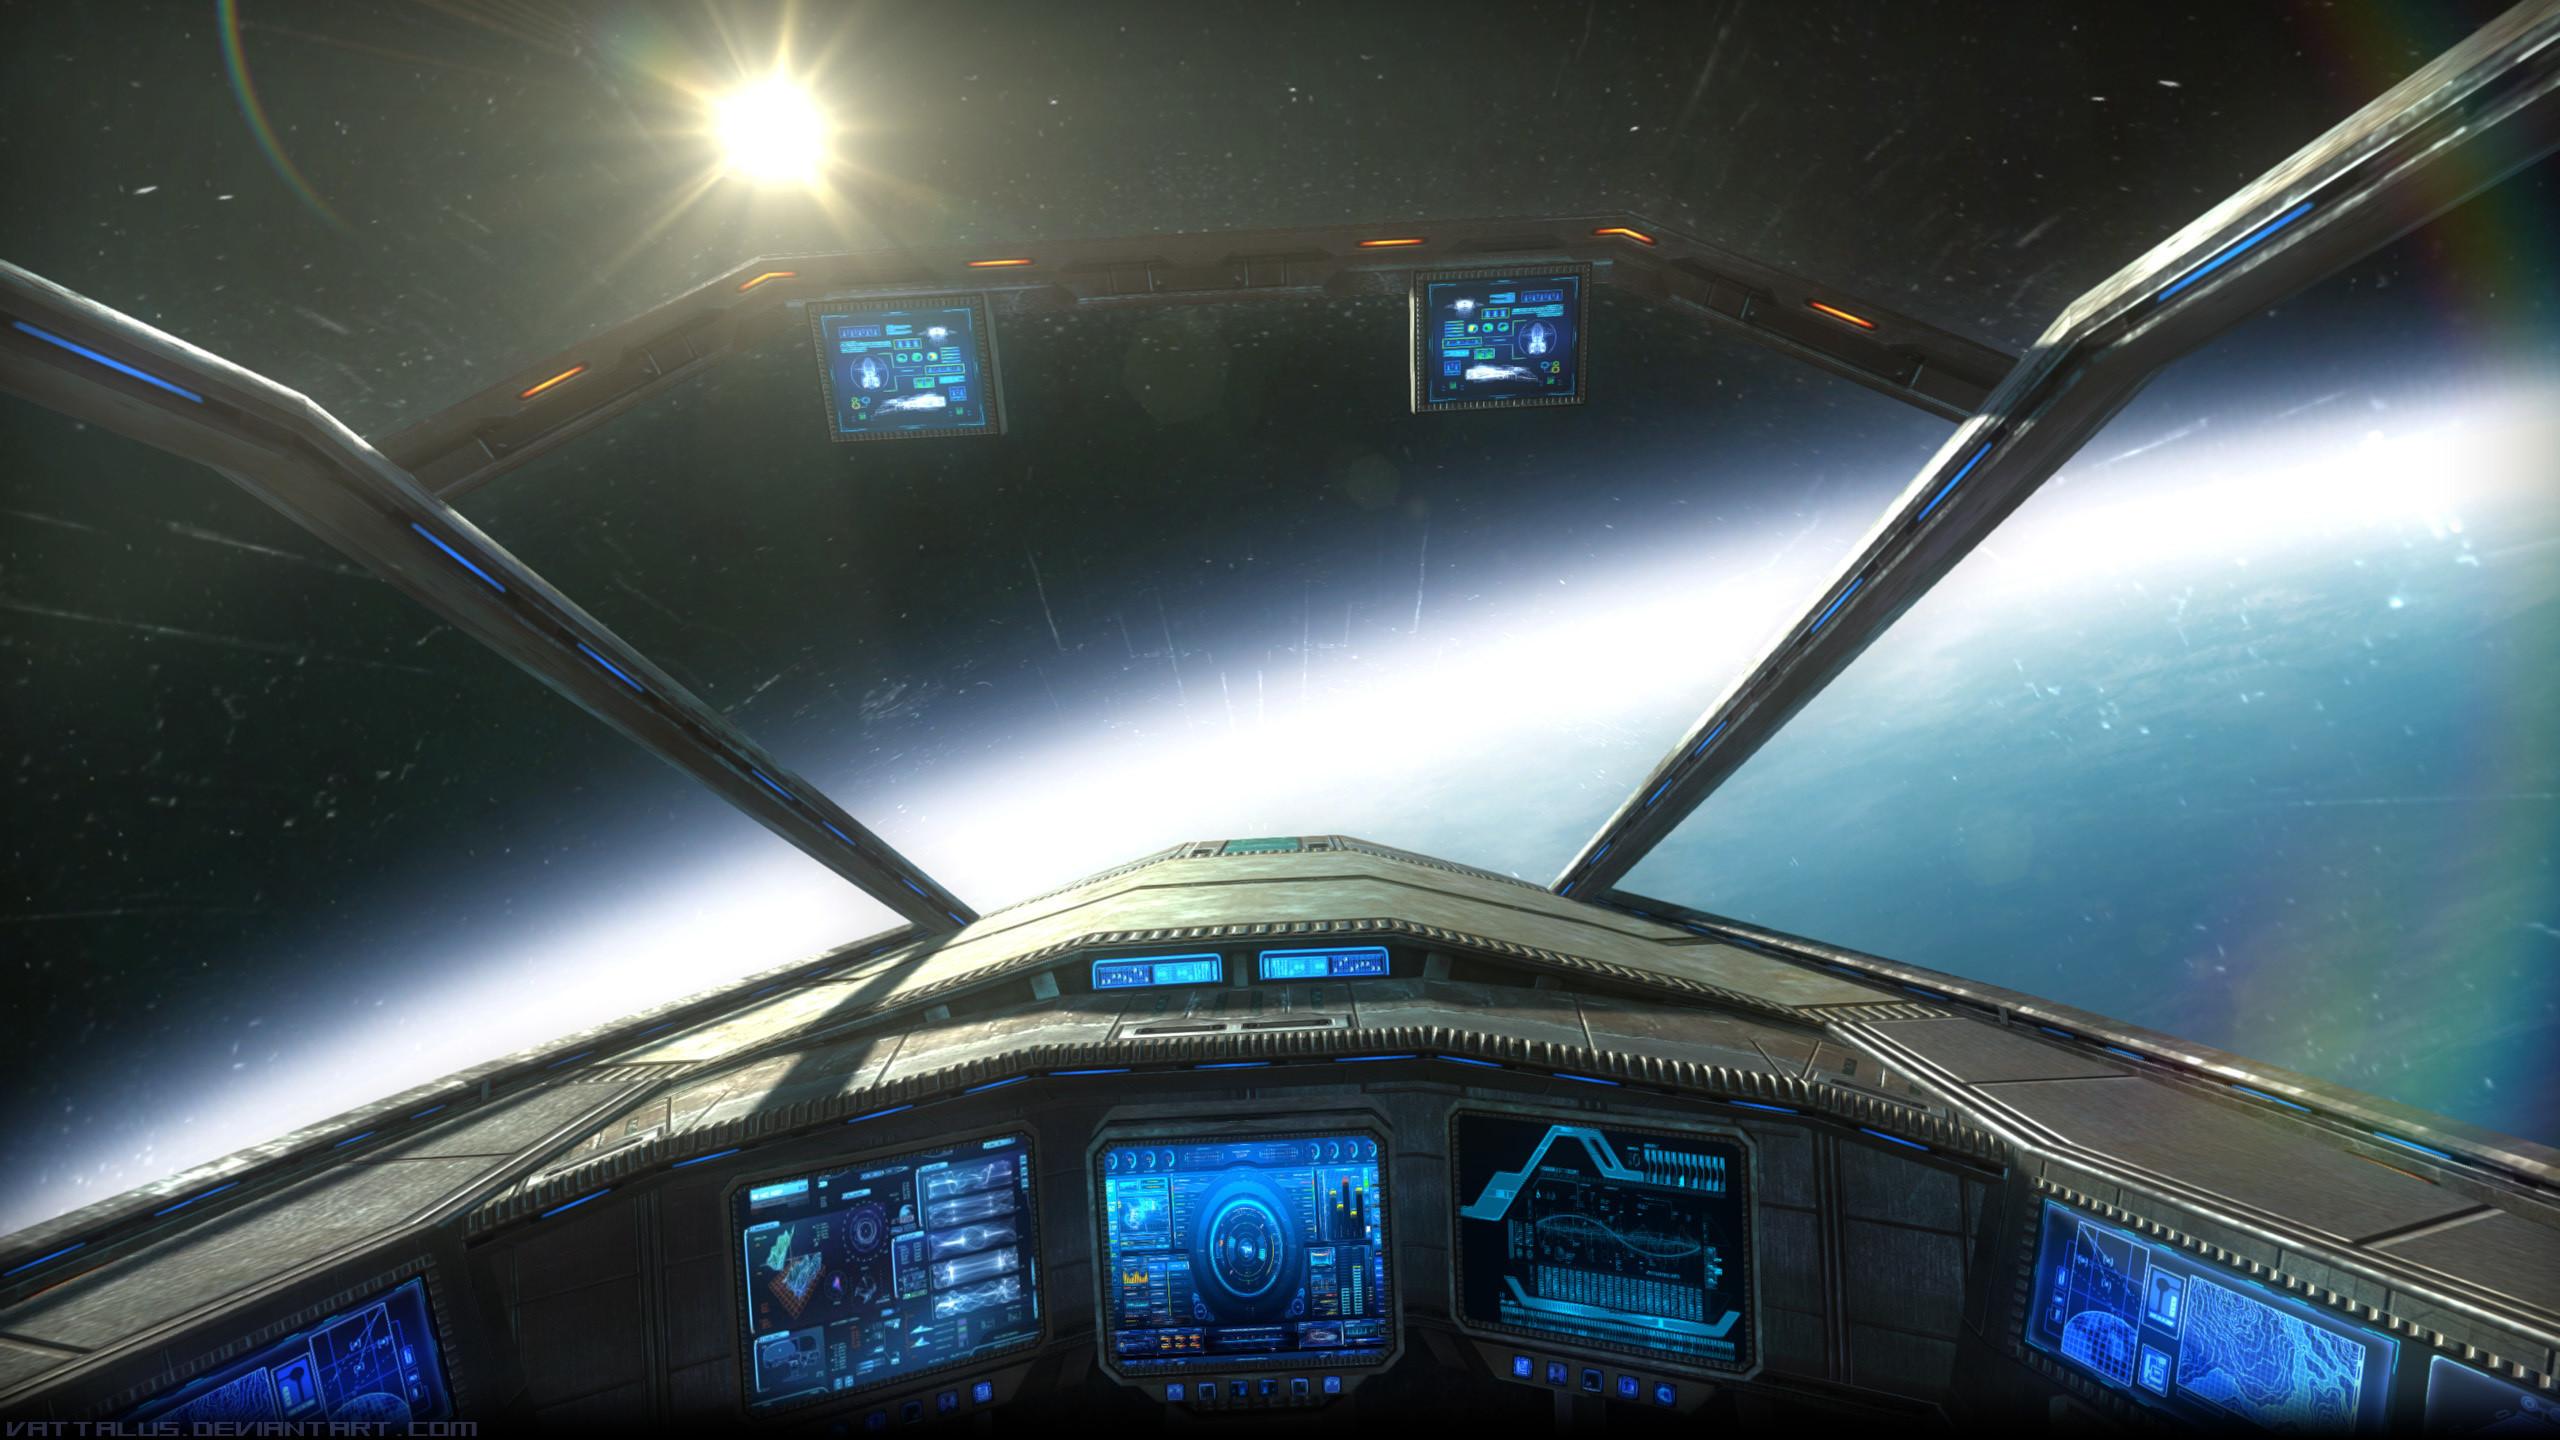 Fantasy Wallpaper, sci-fi, spaceship, space, panel – HD Wallpapers .